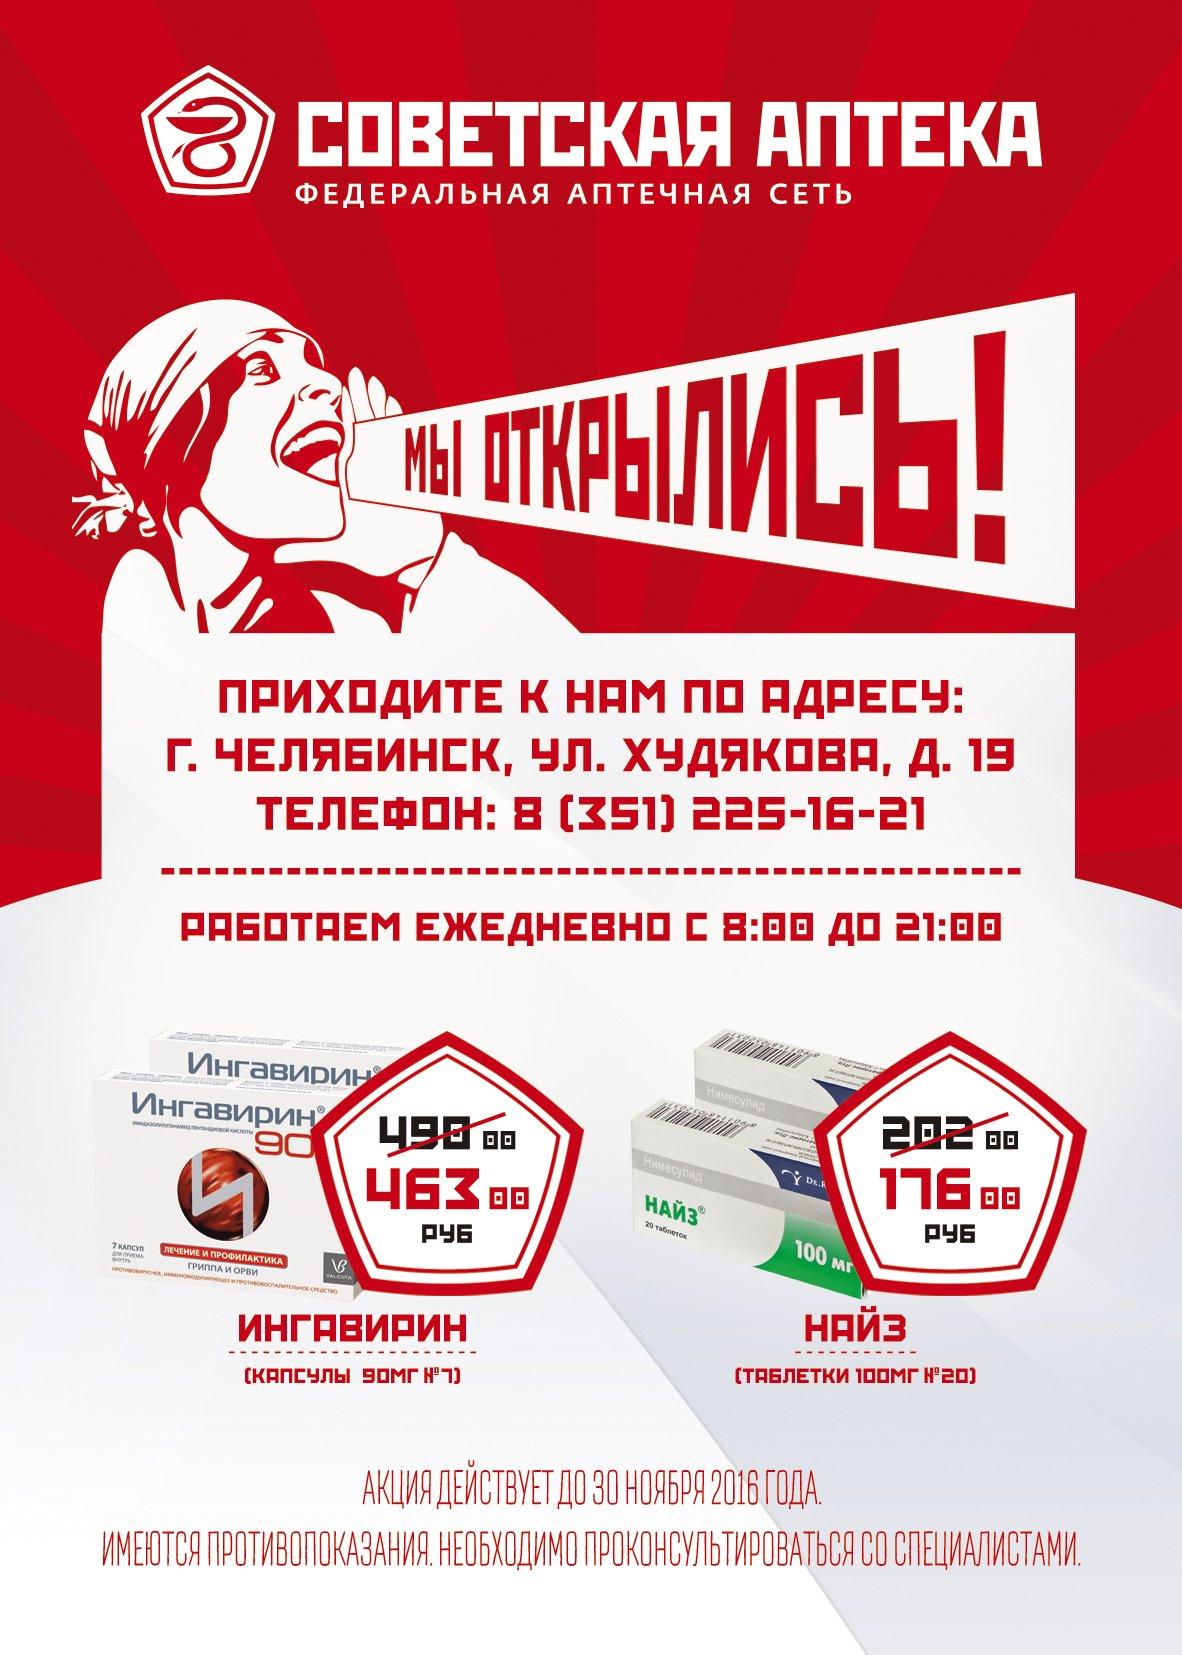 Картинки советская аптека пациента